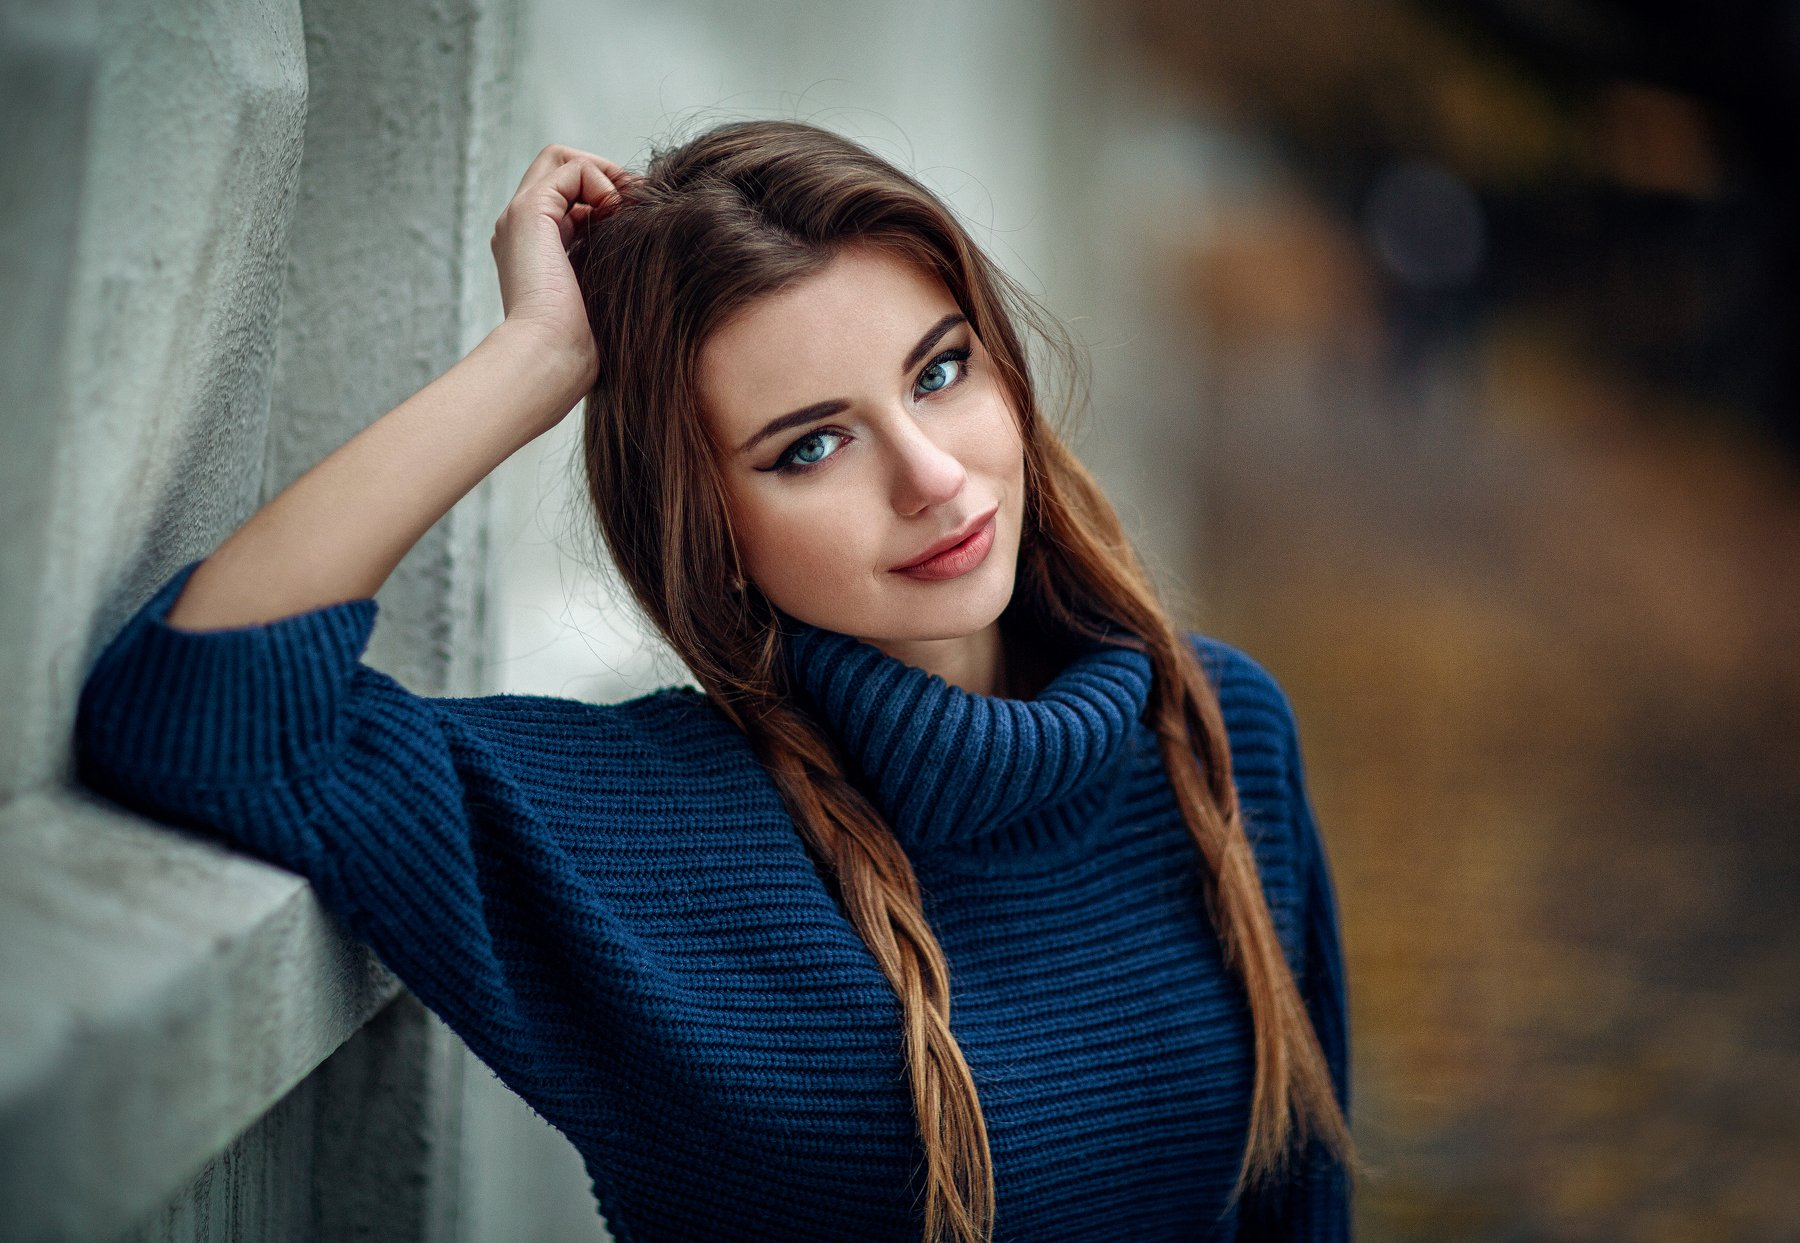 #portrait #beautiful #model #russia #moscow #Autumn, Hakan Erenler